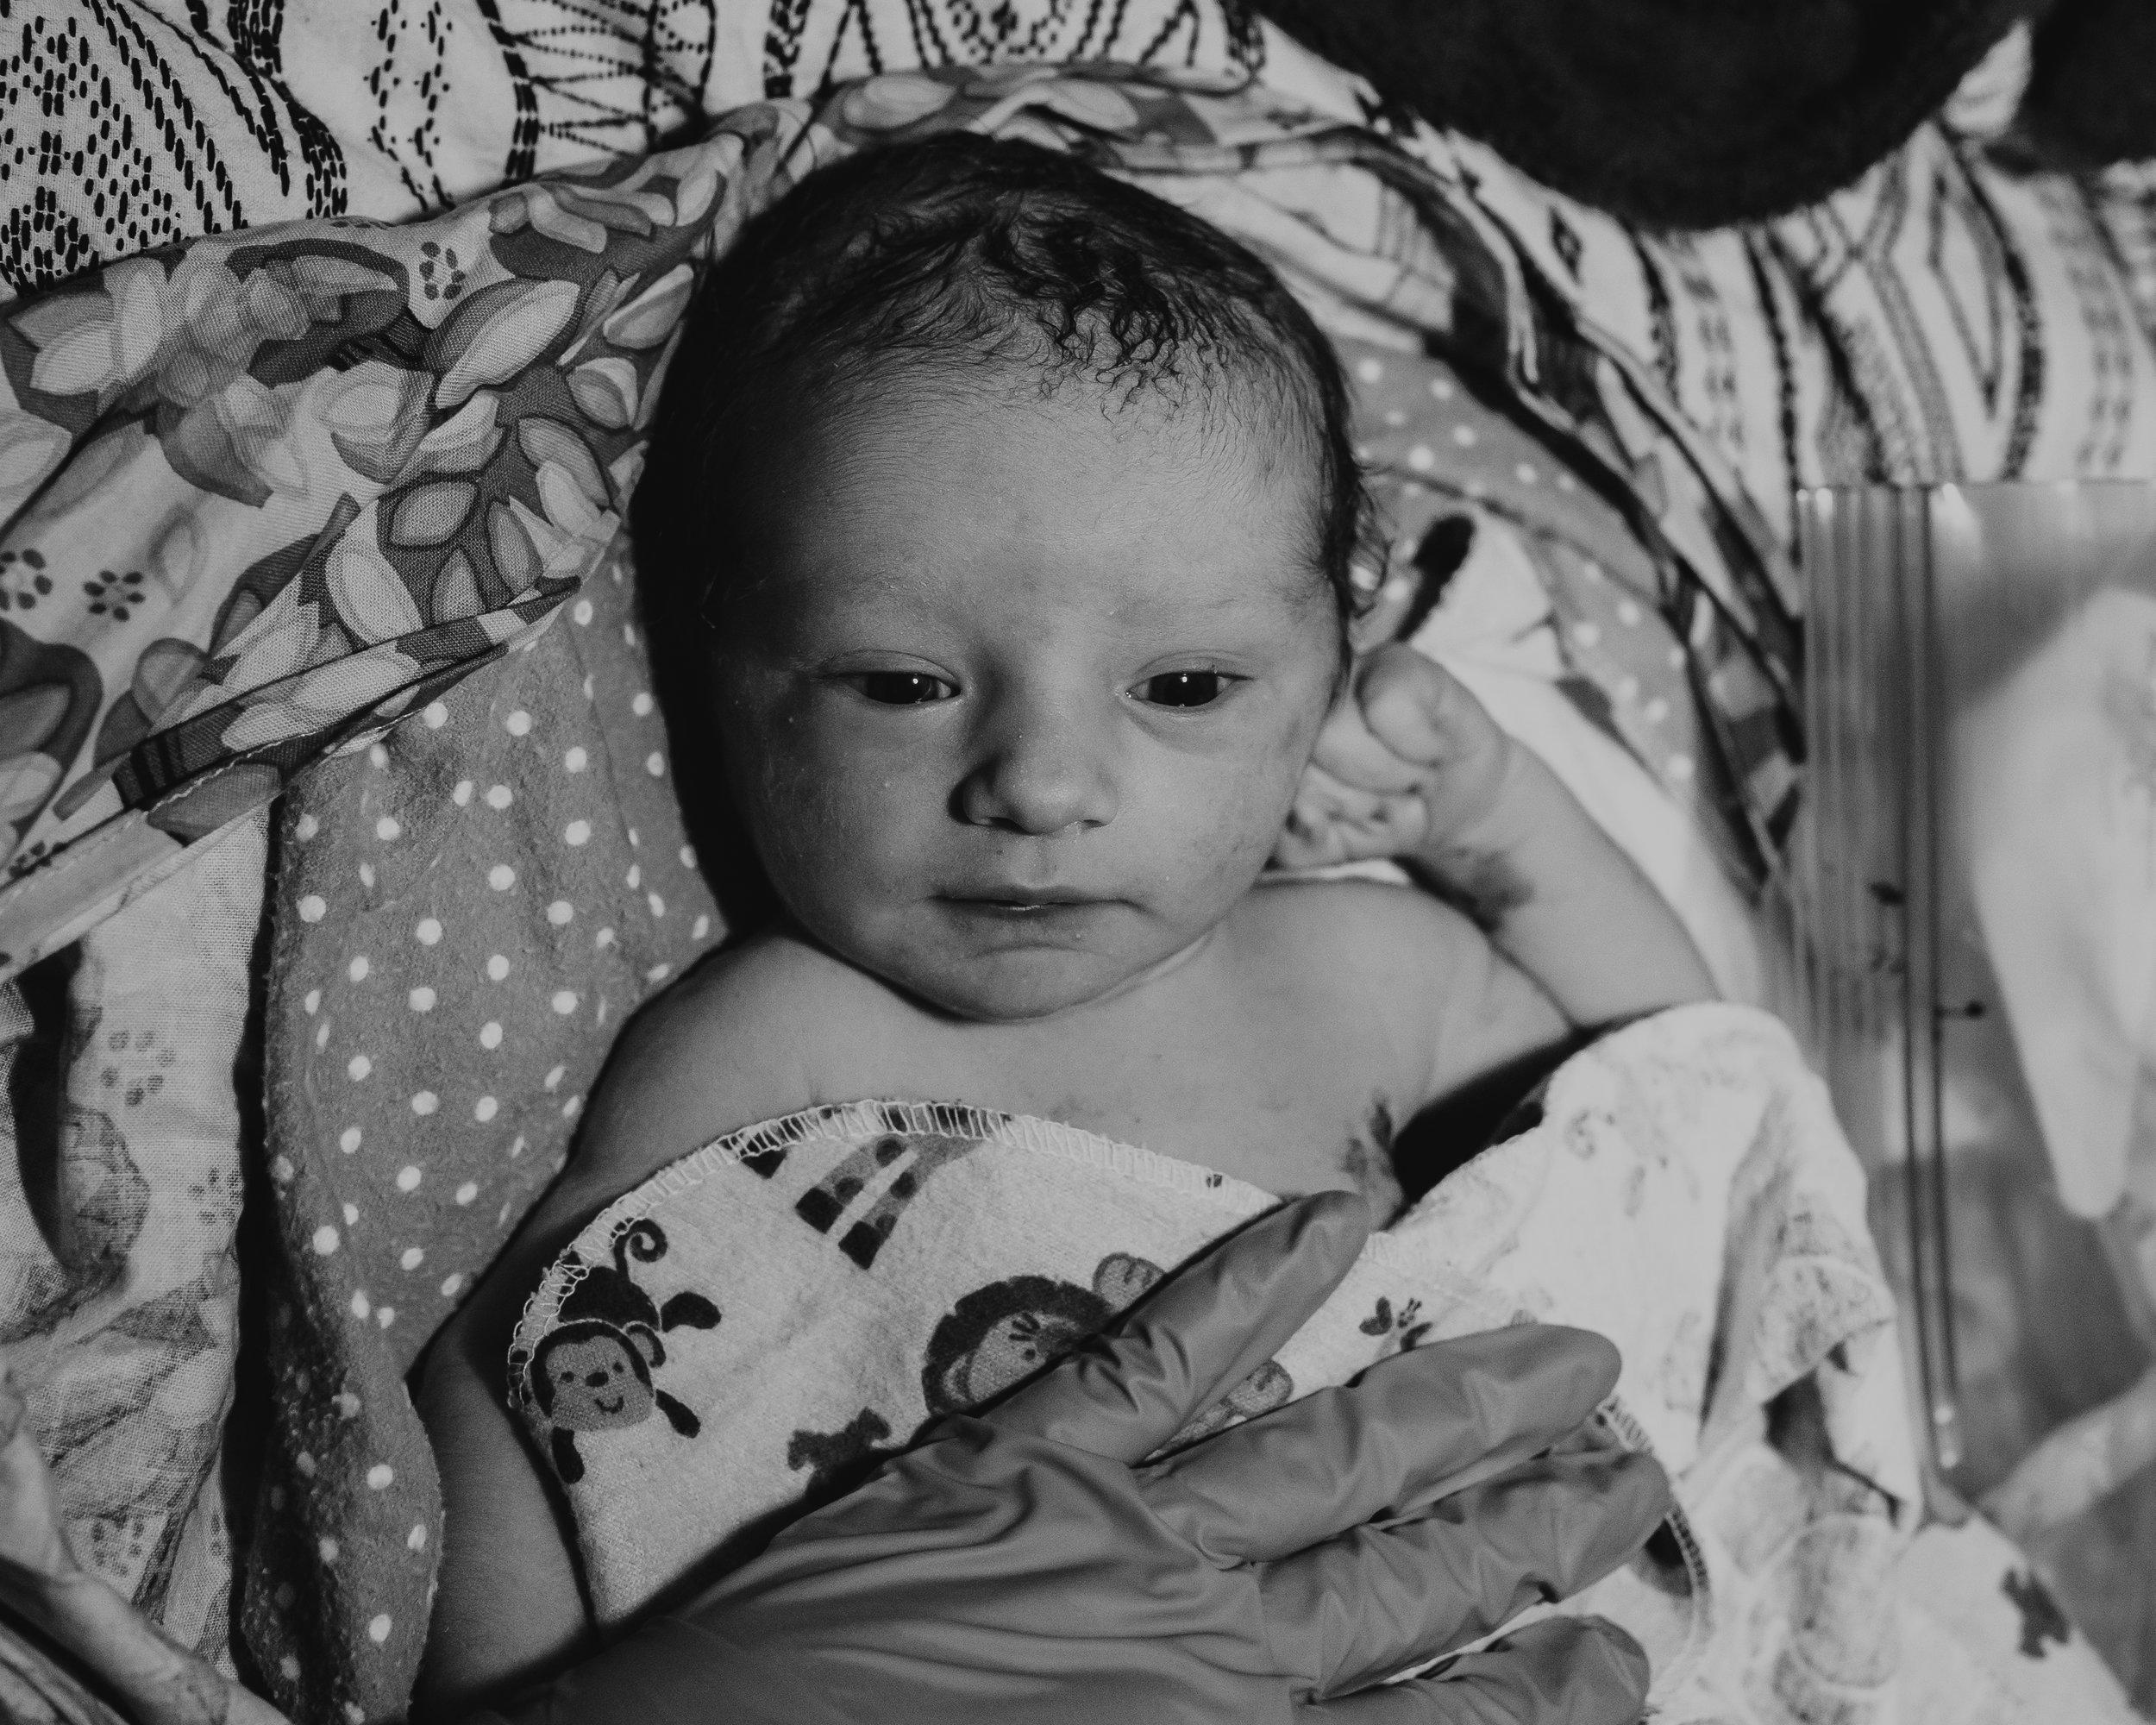 Copy of Birth Photographer Covington LA Mandville LA Maternity Newborn Photography NOLA New Orleans Louisiana Birth Photography home birth midwife midwifery doula